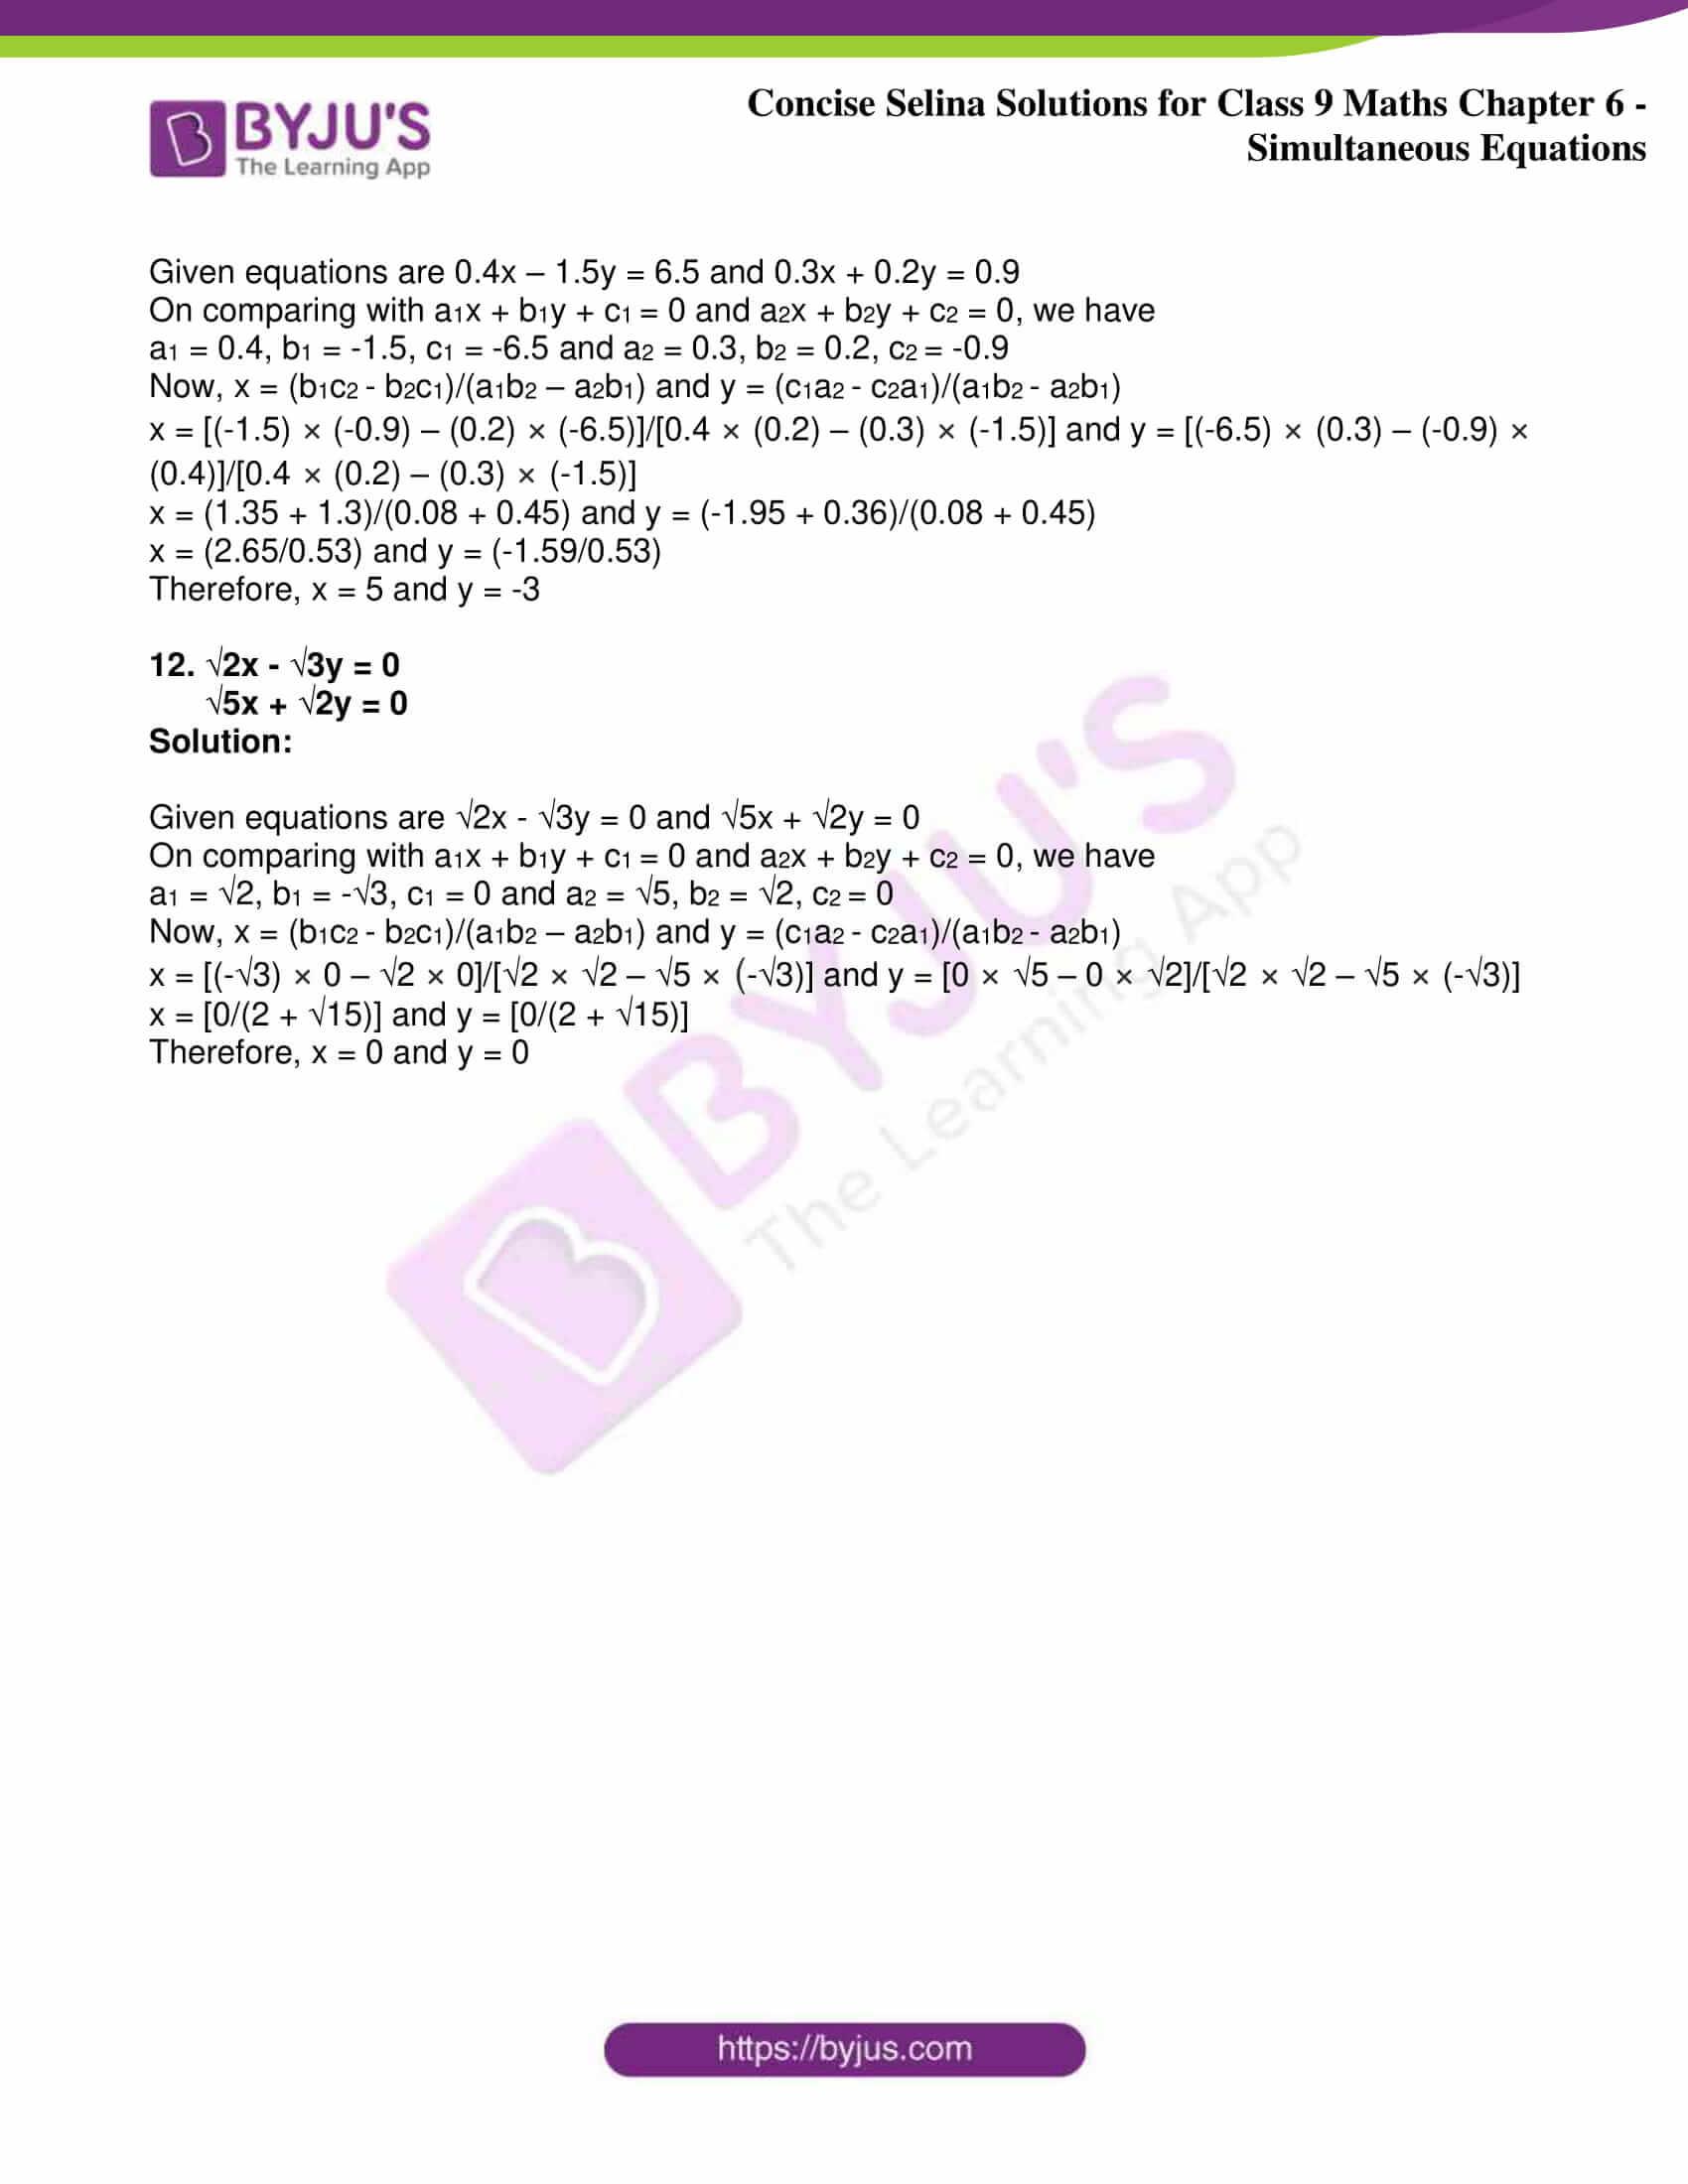 icse class 9 jun7 maths selina solutions chapter 6 simultaneous equations 23